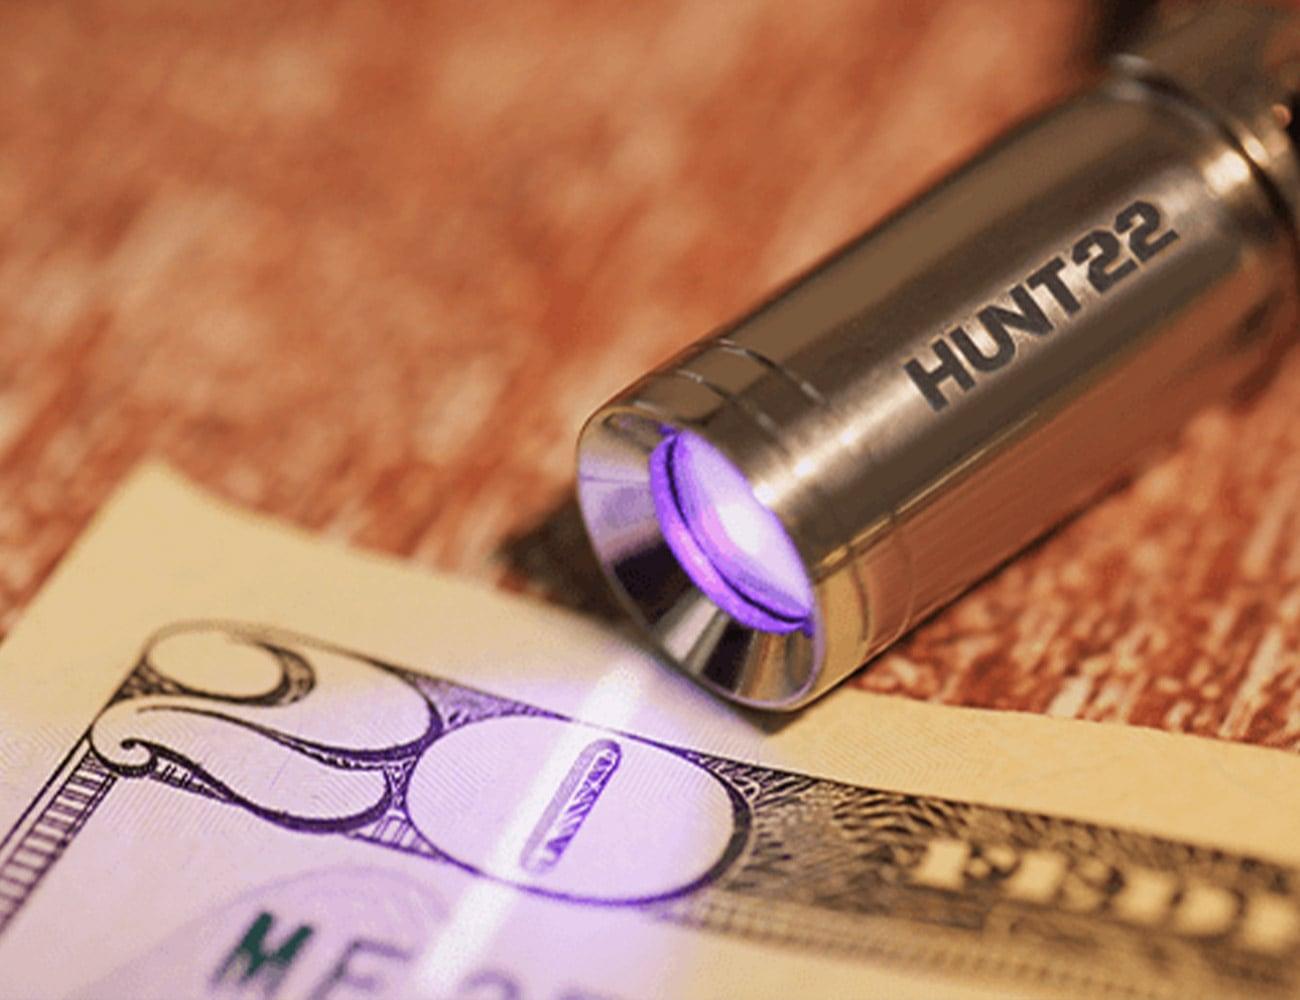 HUNT22 Ultra Compact UV Flashlight measures less than an inch long